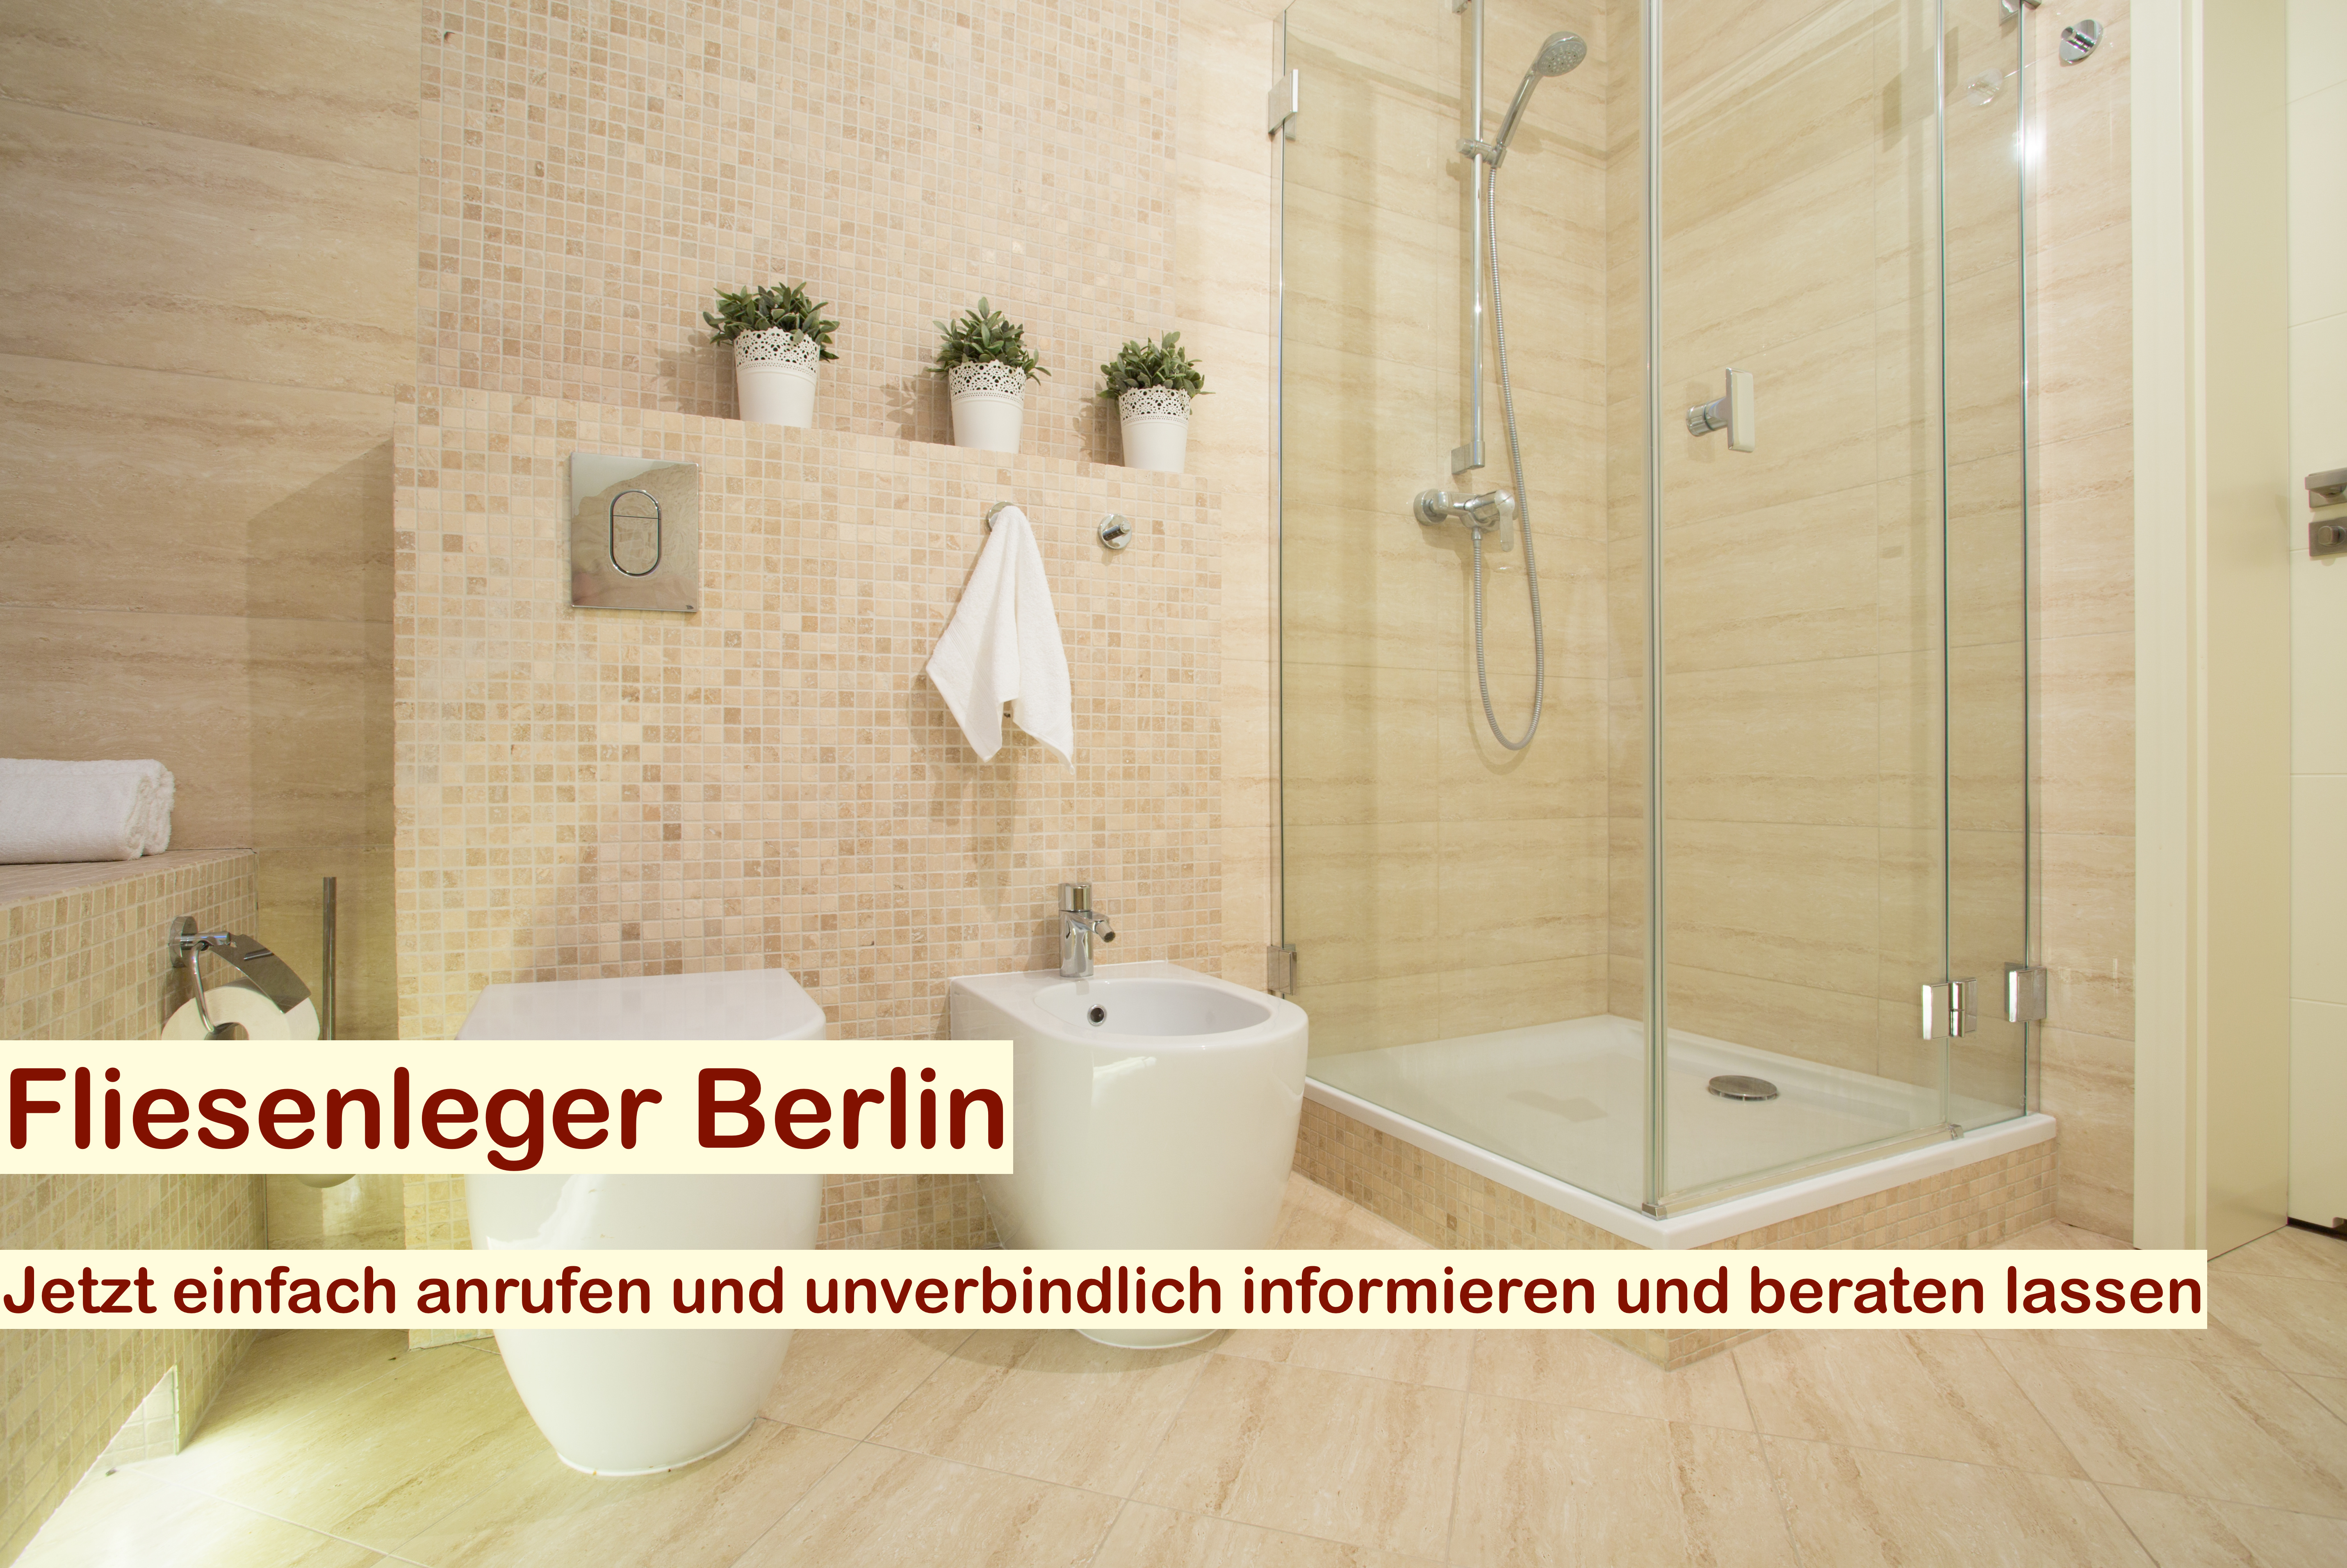 Fliesenleger Berlin - Fliesenlegearbeiten